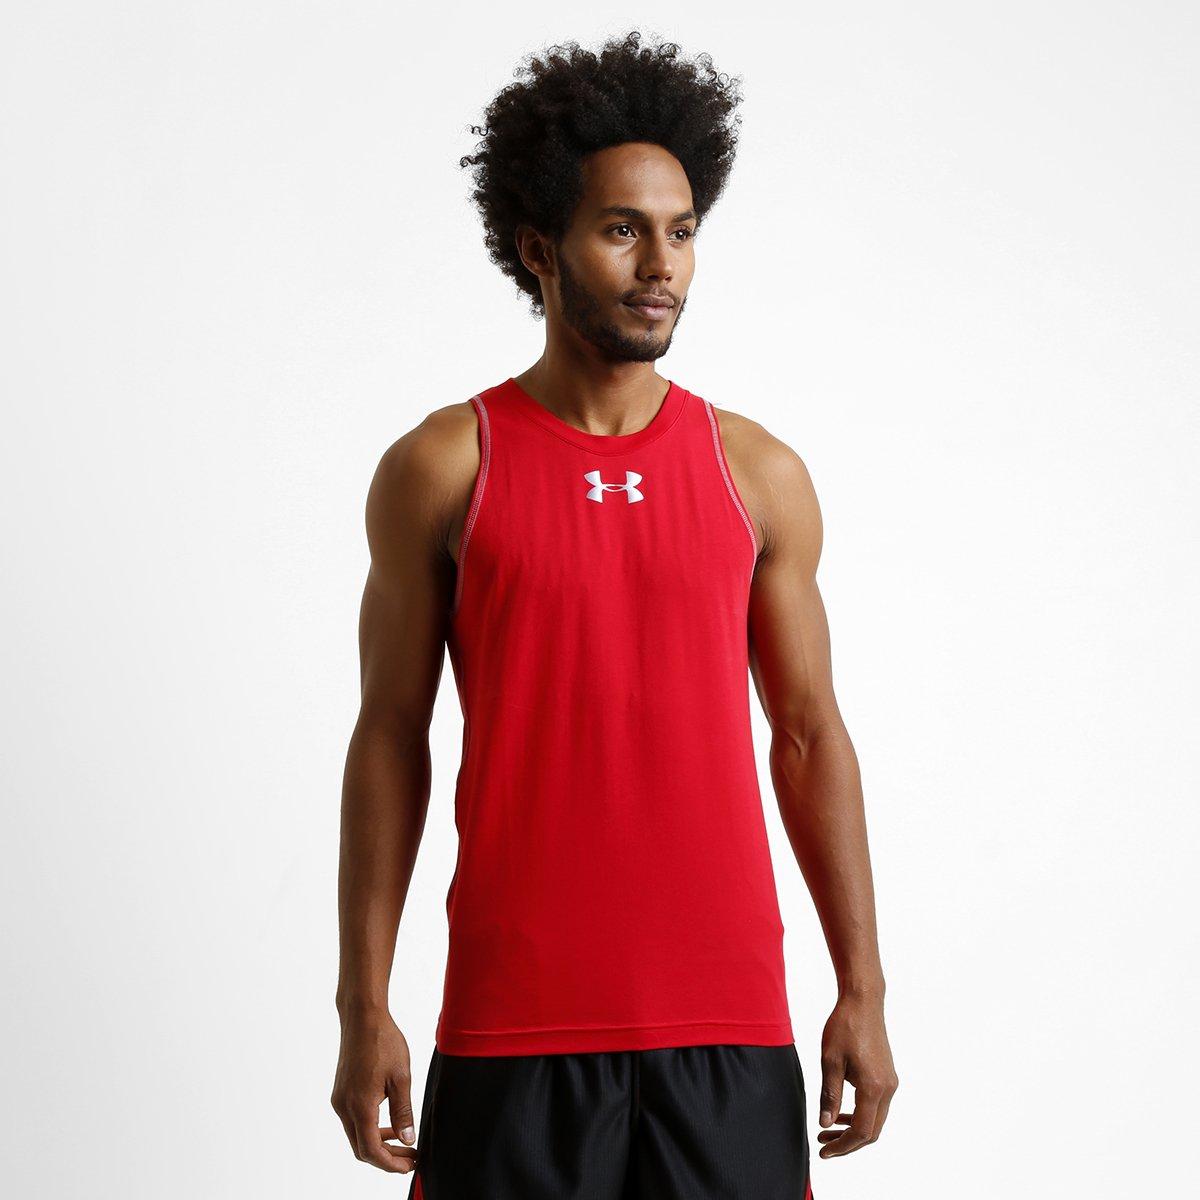 ab1e4526a11 Camiseta Regata Under Armour Jus Sayin Too - Compre Agora